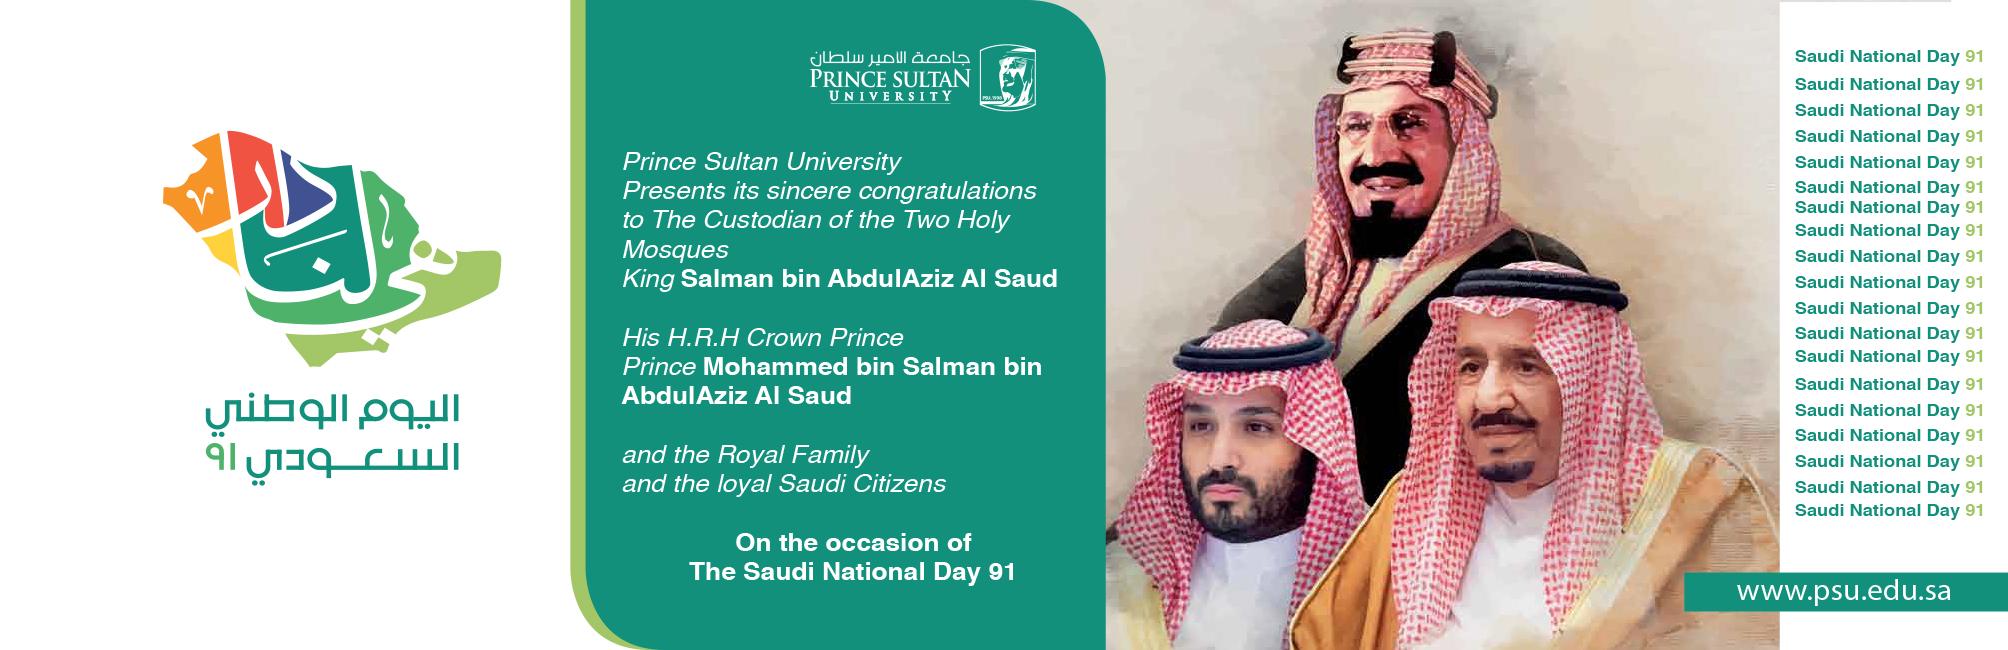 91st Saudi National Day